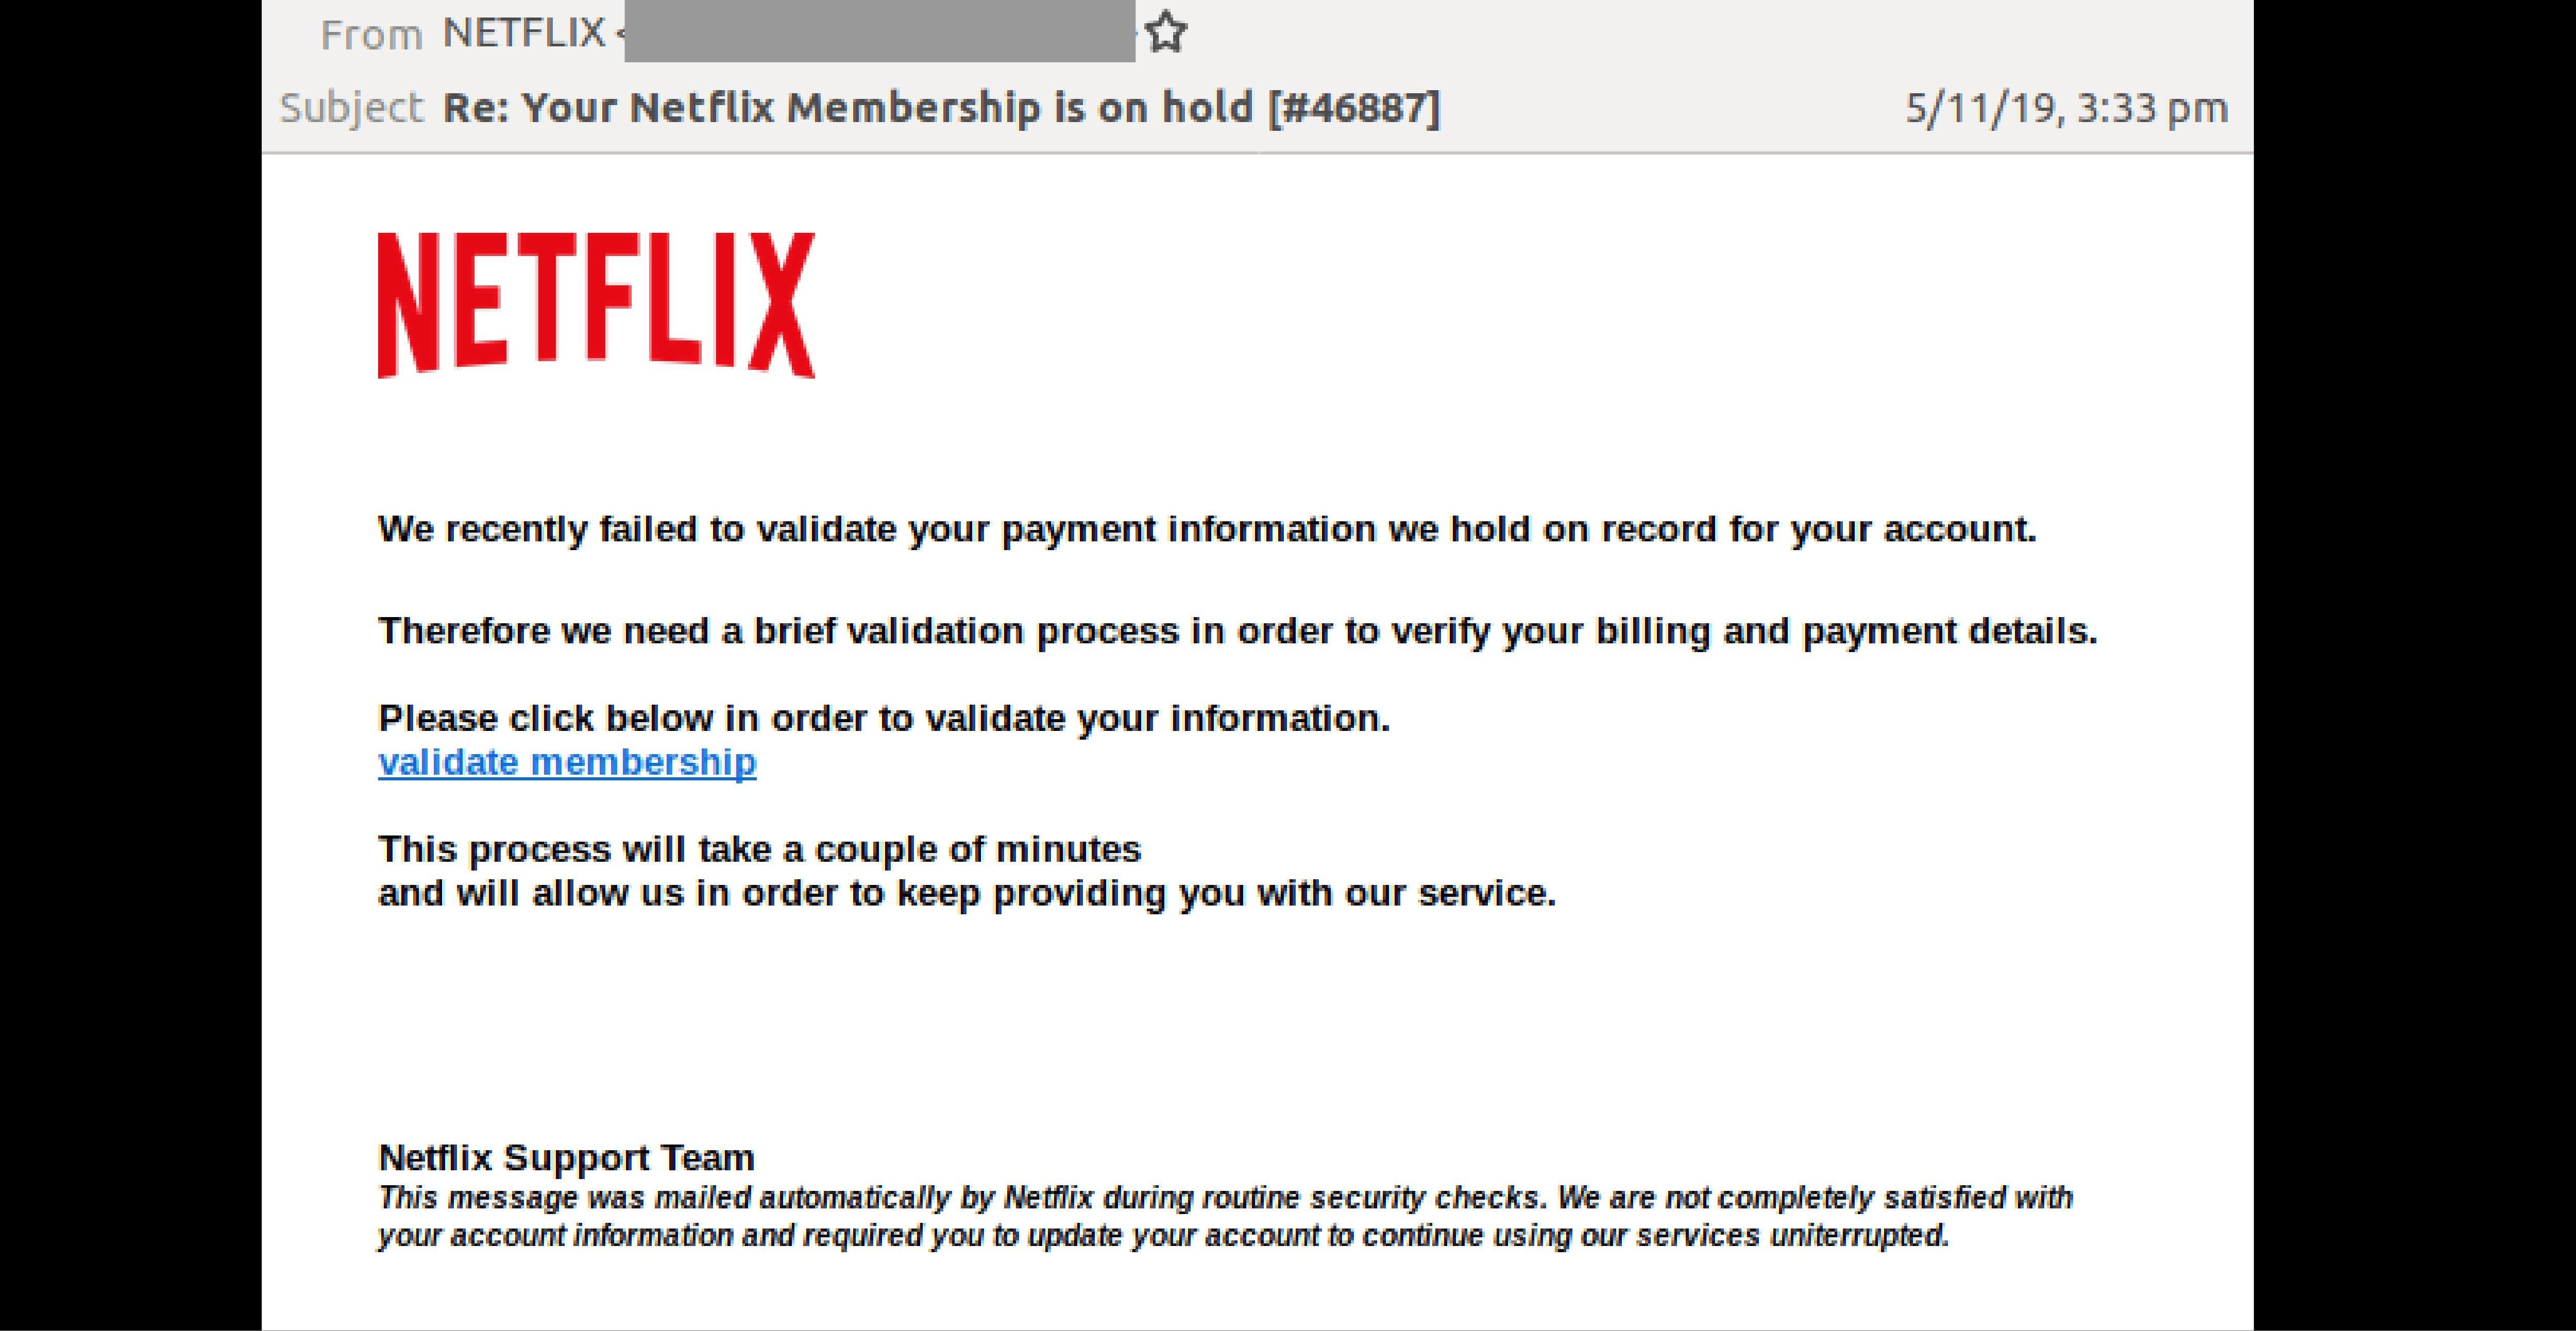 Netflix 06_11 edited